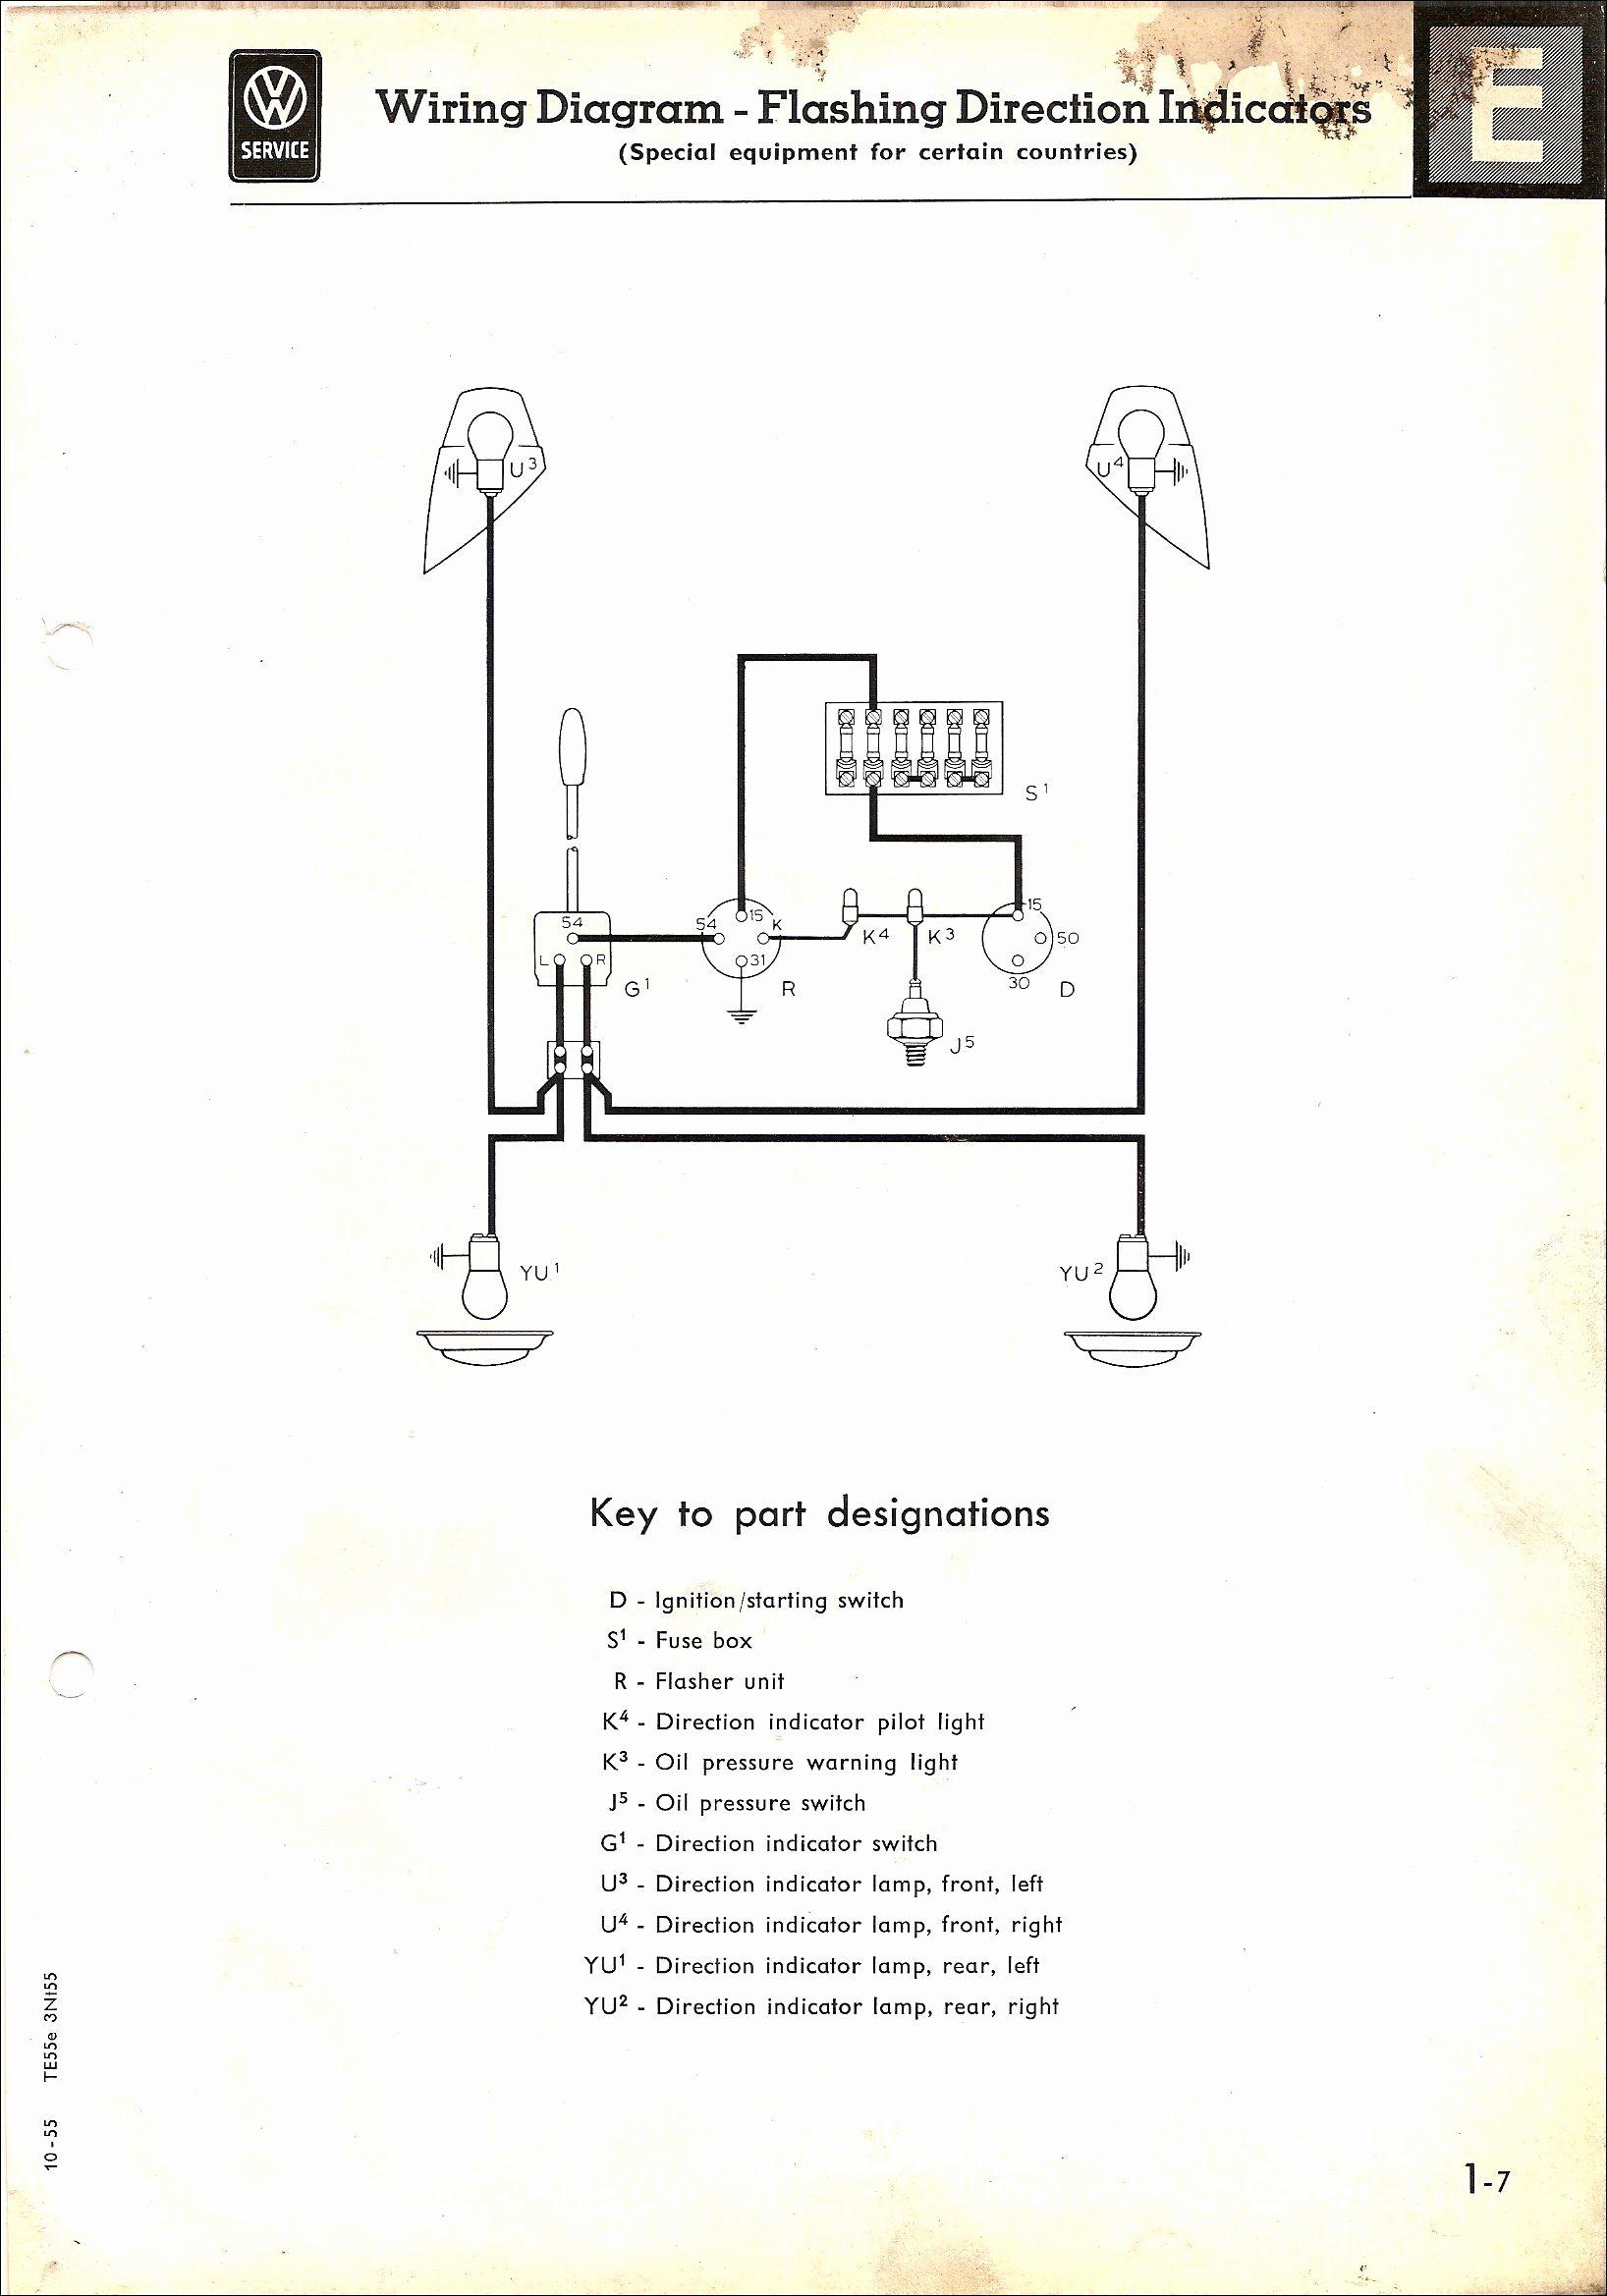 Trane Voyager Wiring Diagram | Best Wiring Library - Data Link Connector Wiring Diagram